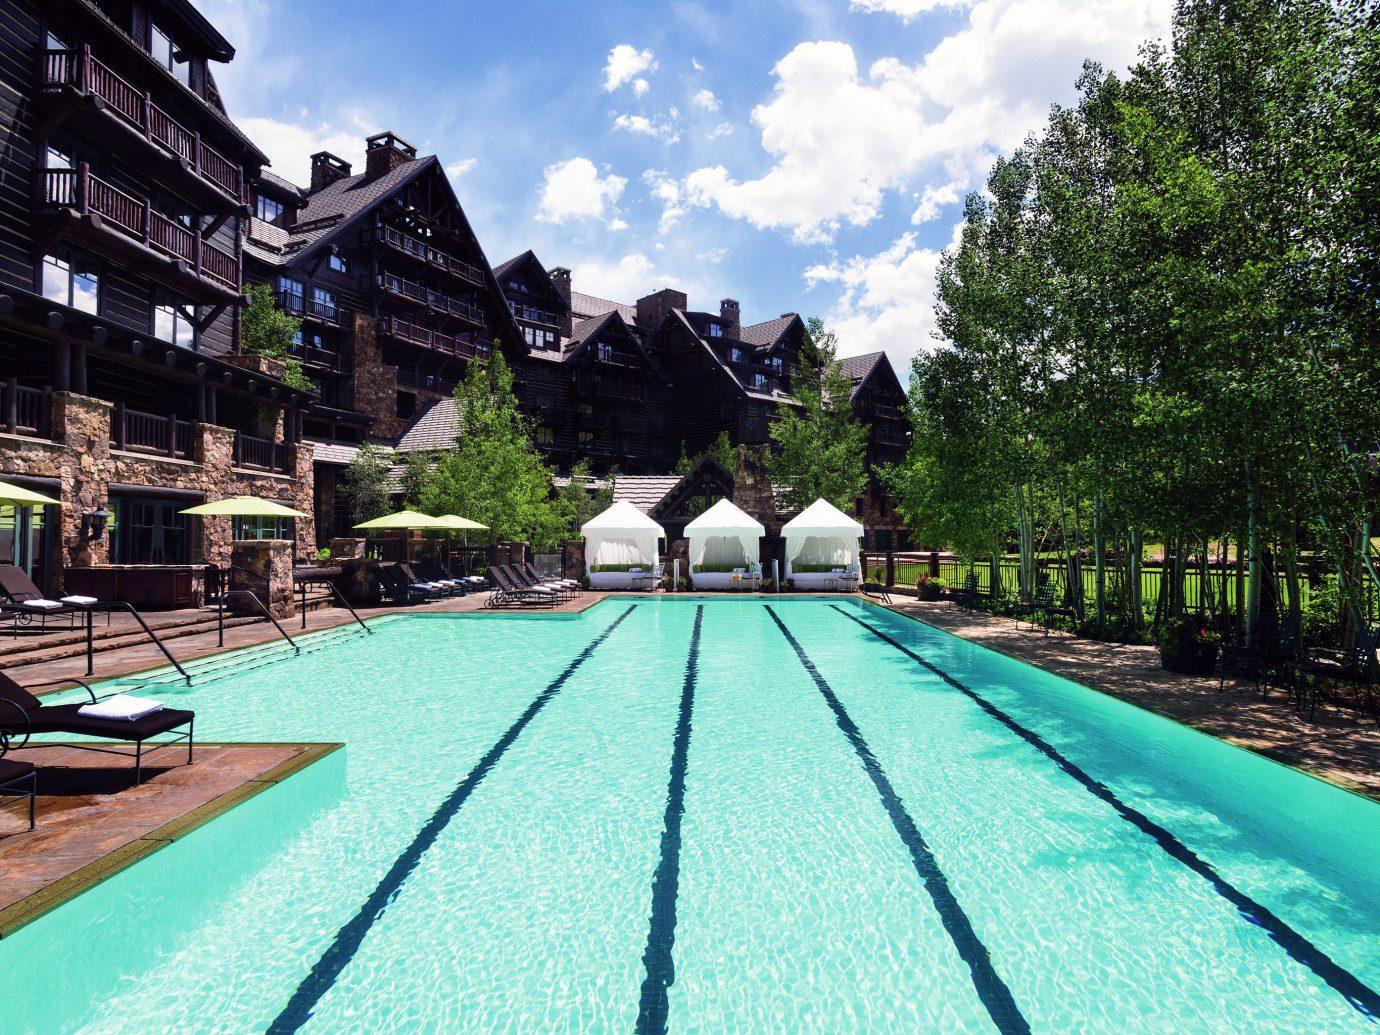 Buildings Exterior Play Pool Resort Trip Ideas outdoor sky tree leisure swimming pool estate vacation park amusement park